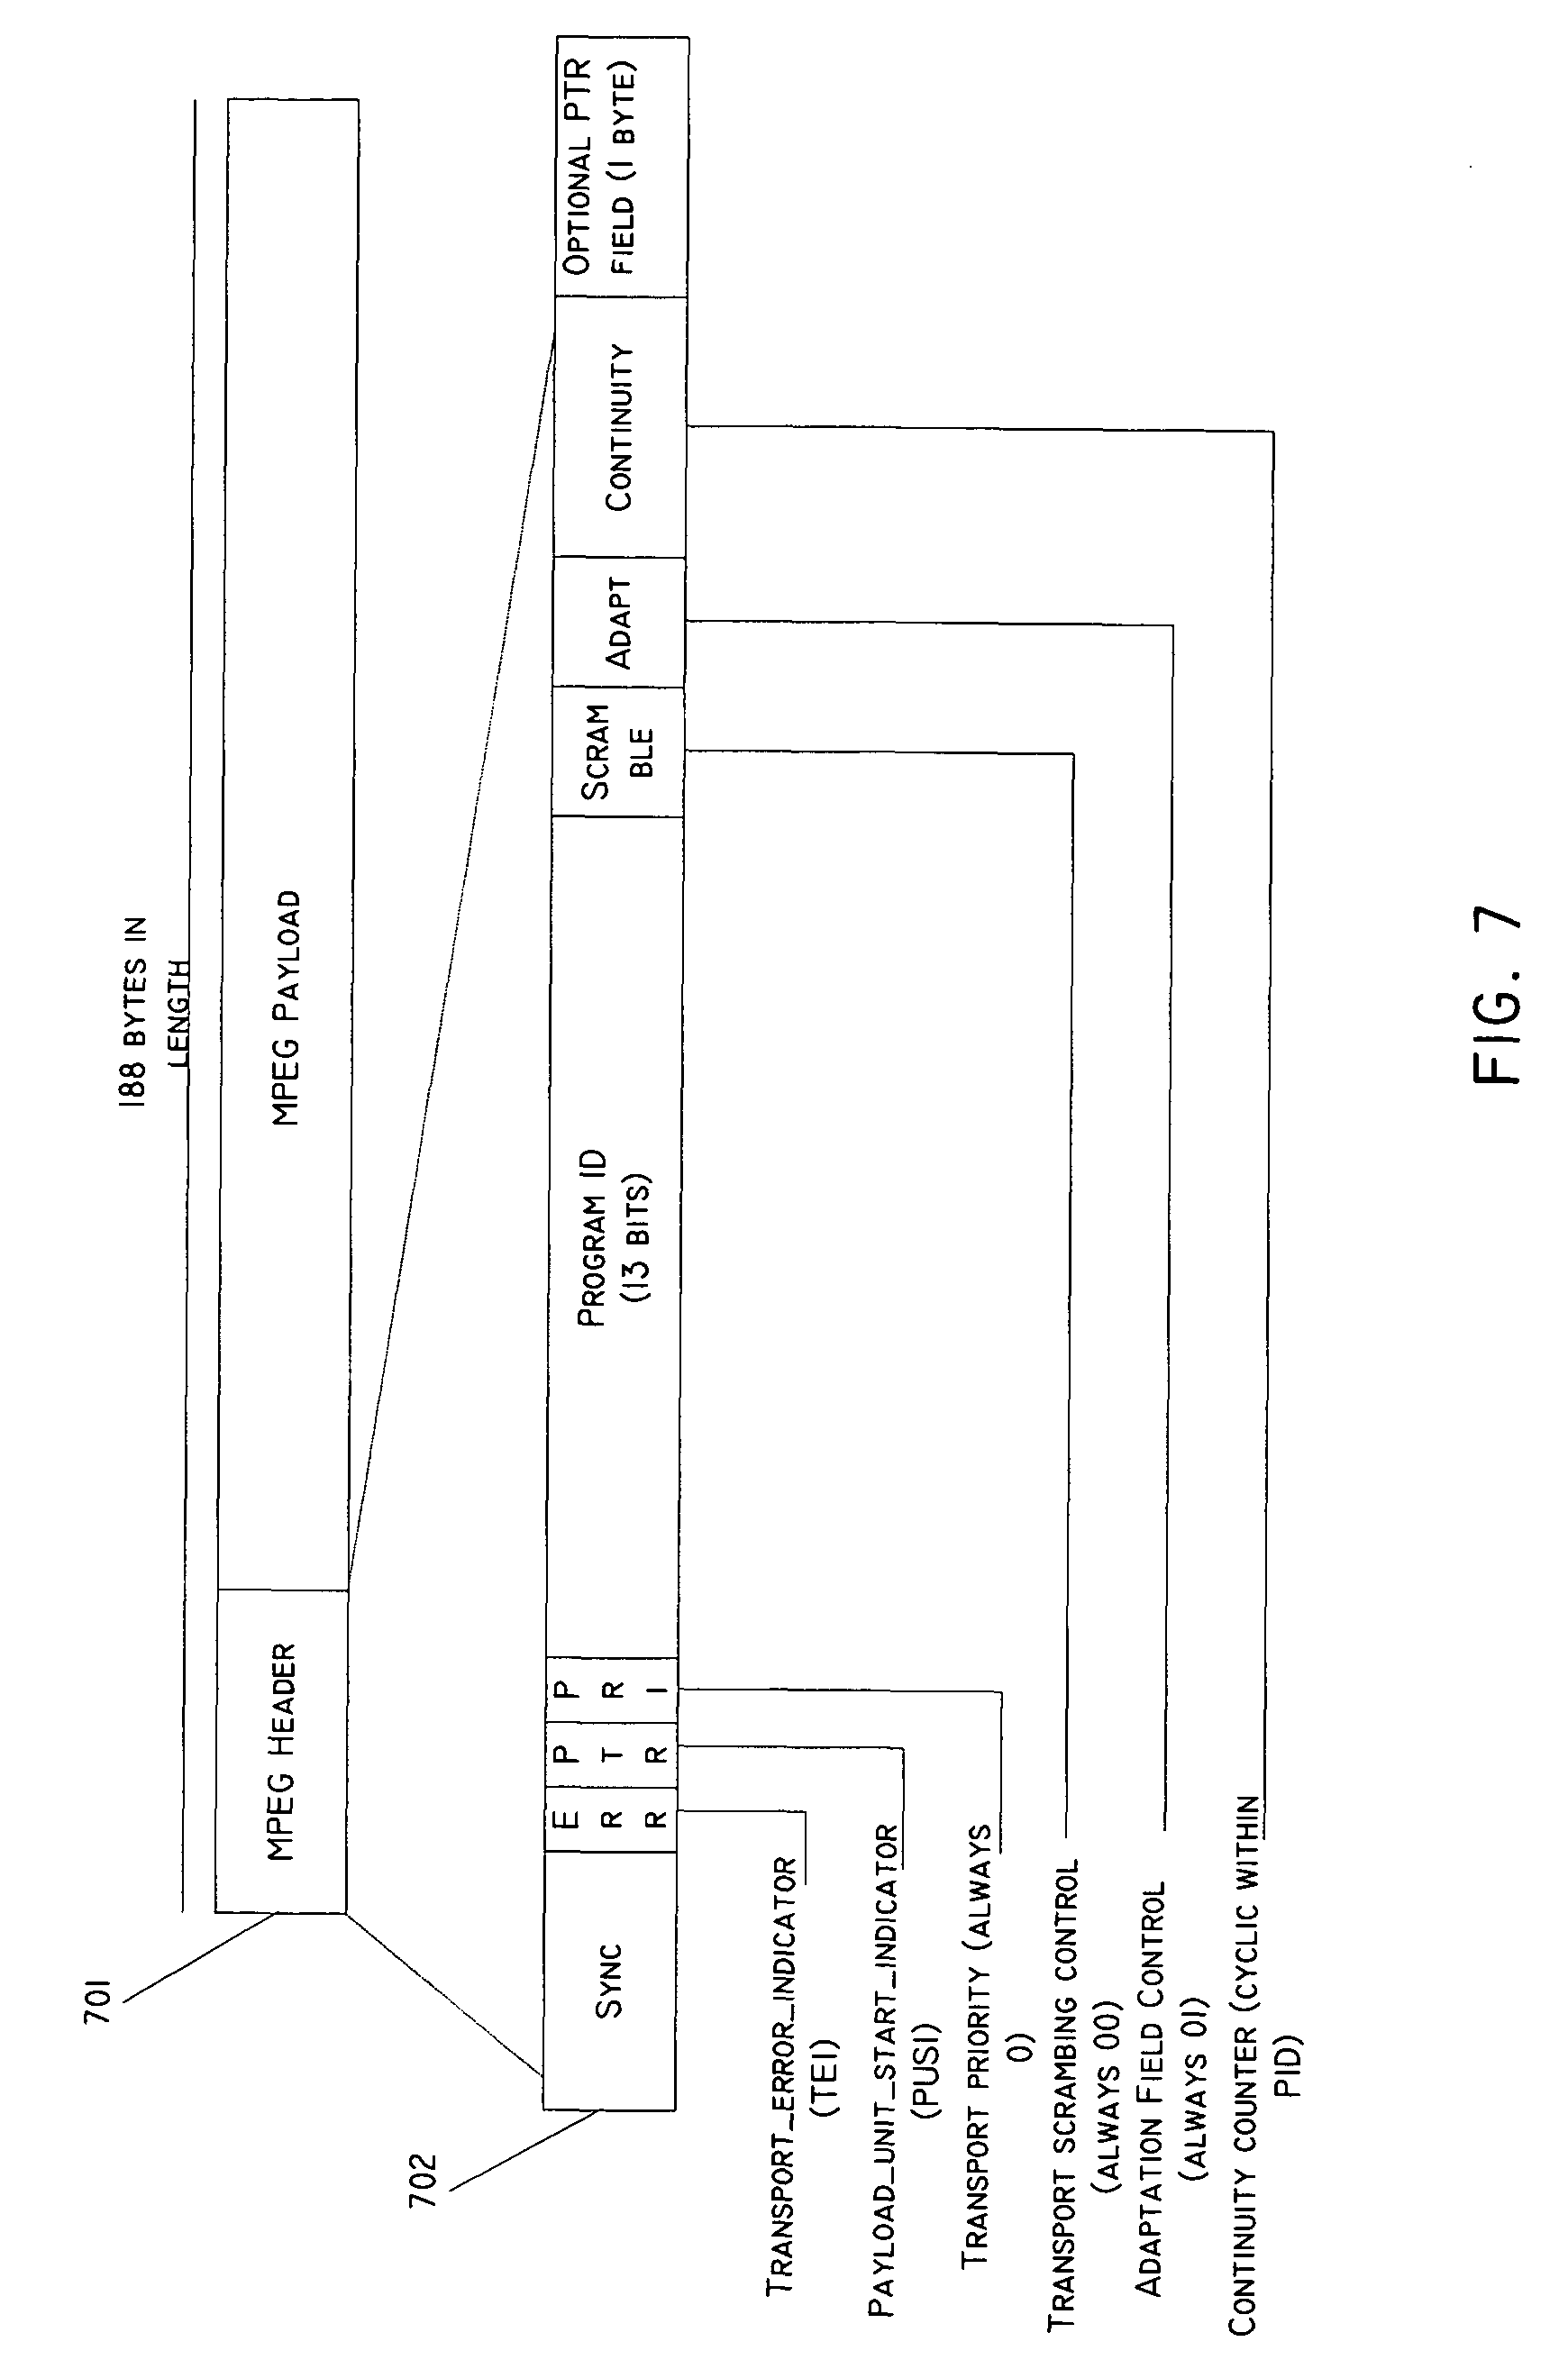 comcast home wiring diagram 220v motor single phase xfinity network moca